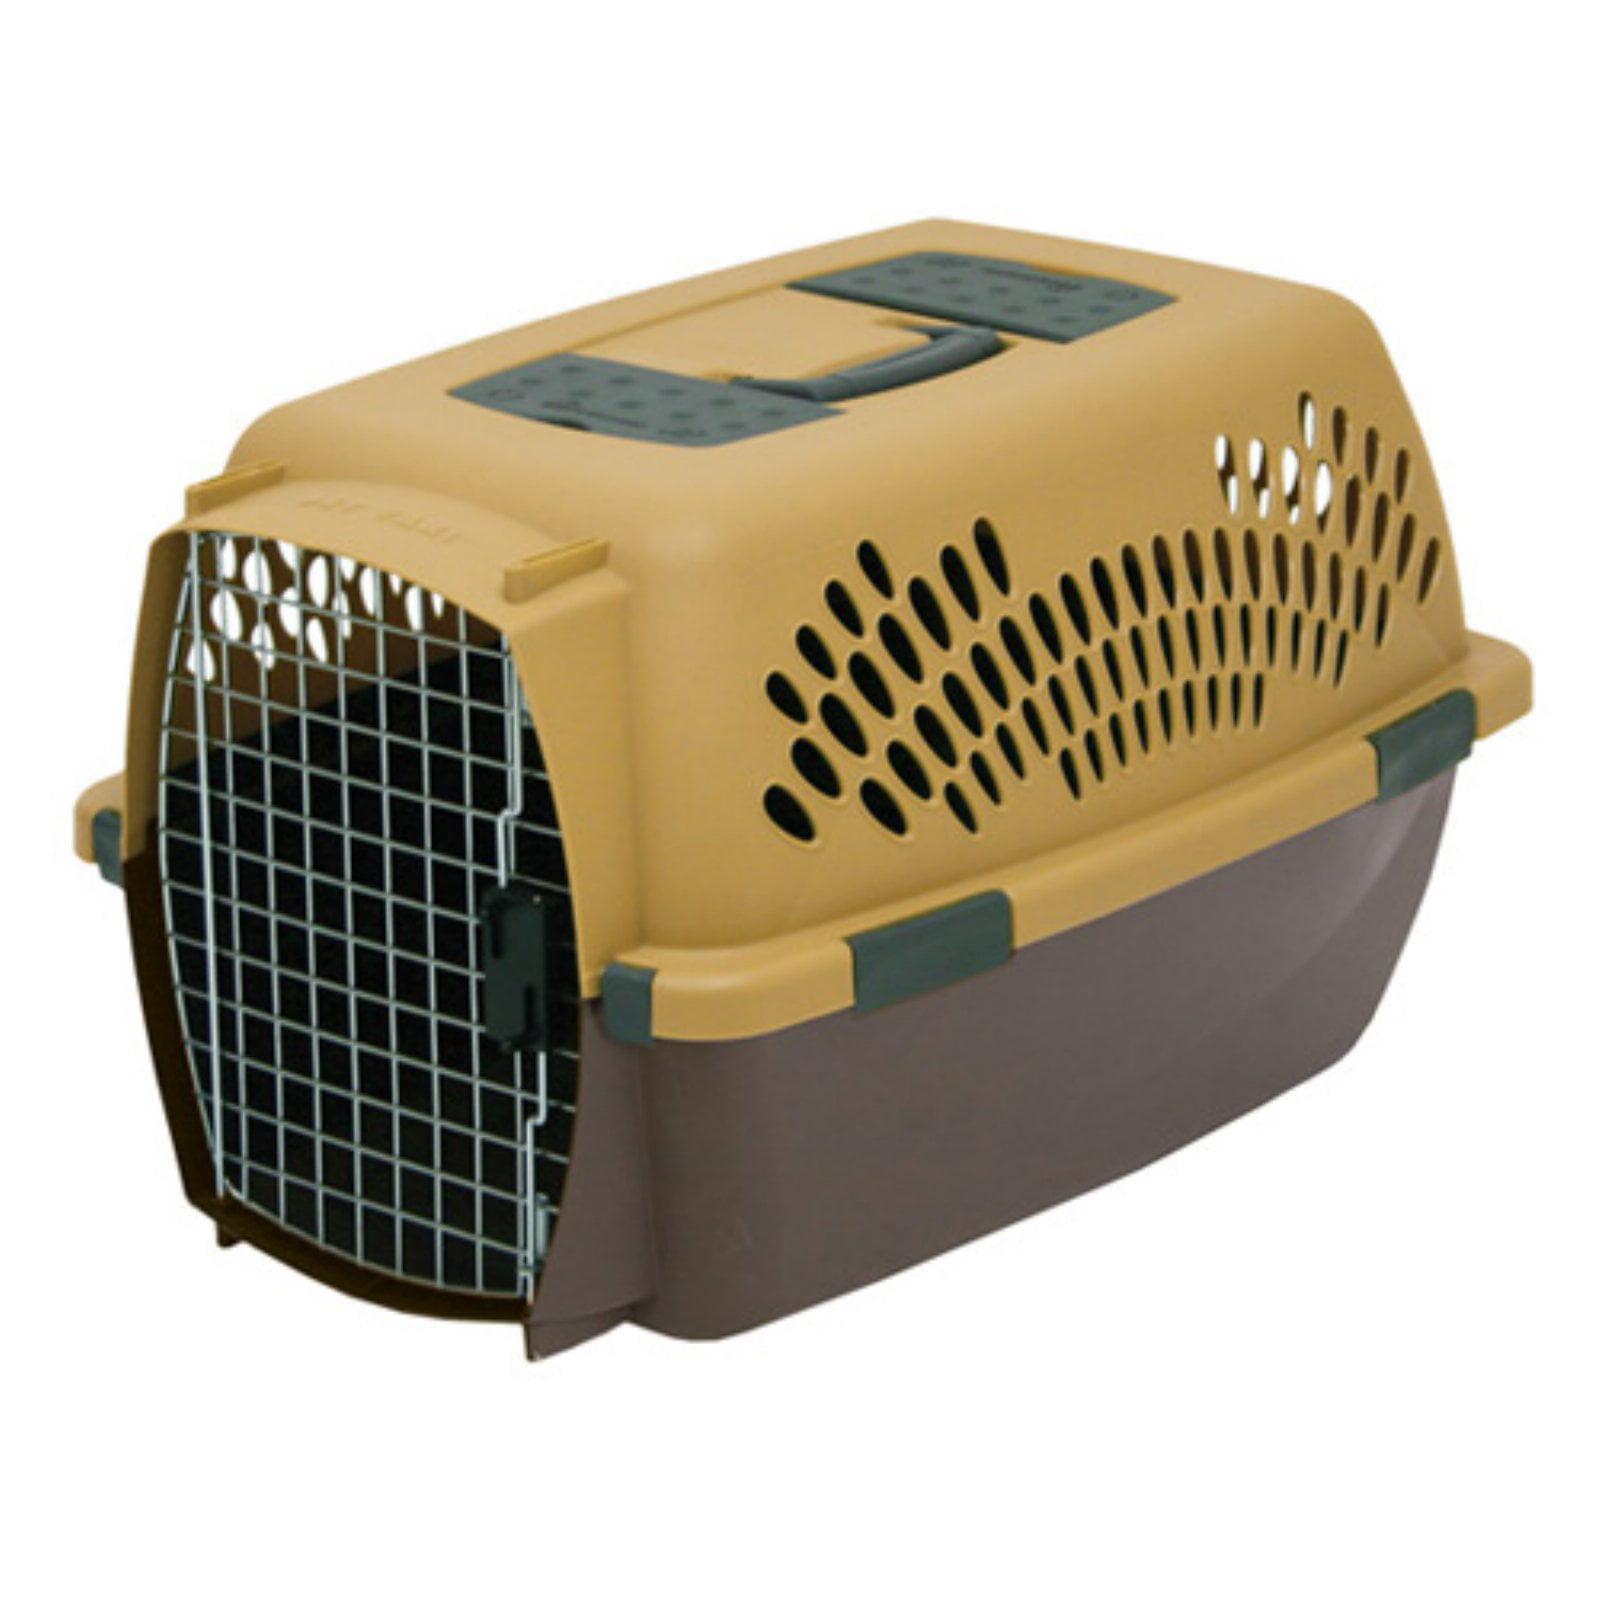 Petmate Aspen Pet Porter Fashion Dog Crate